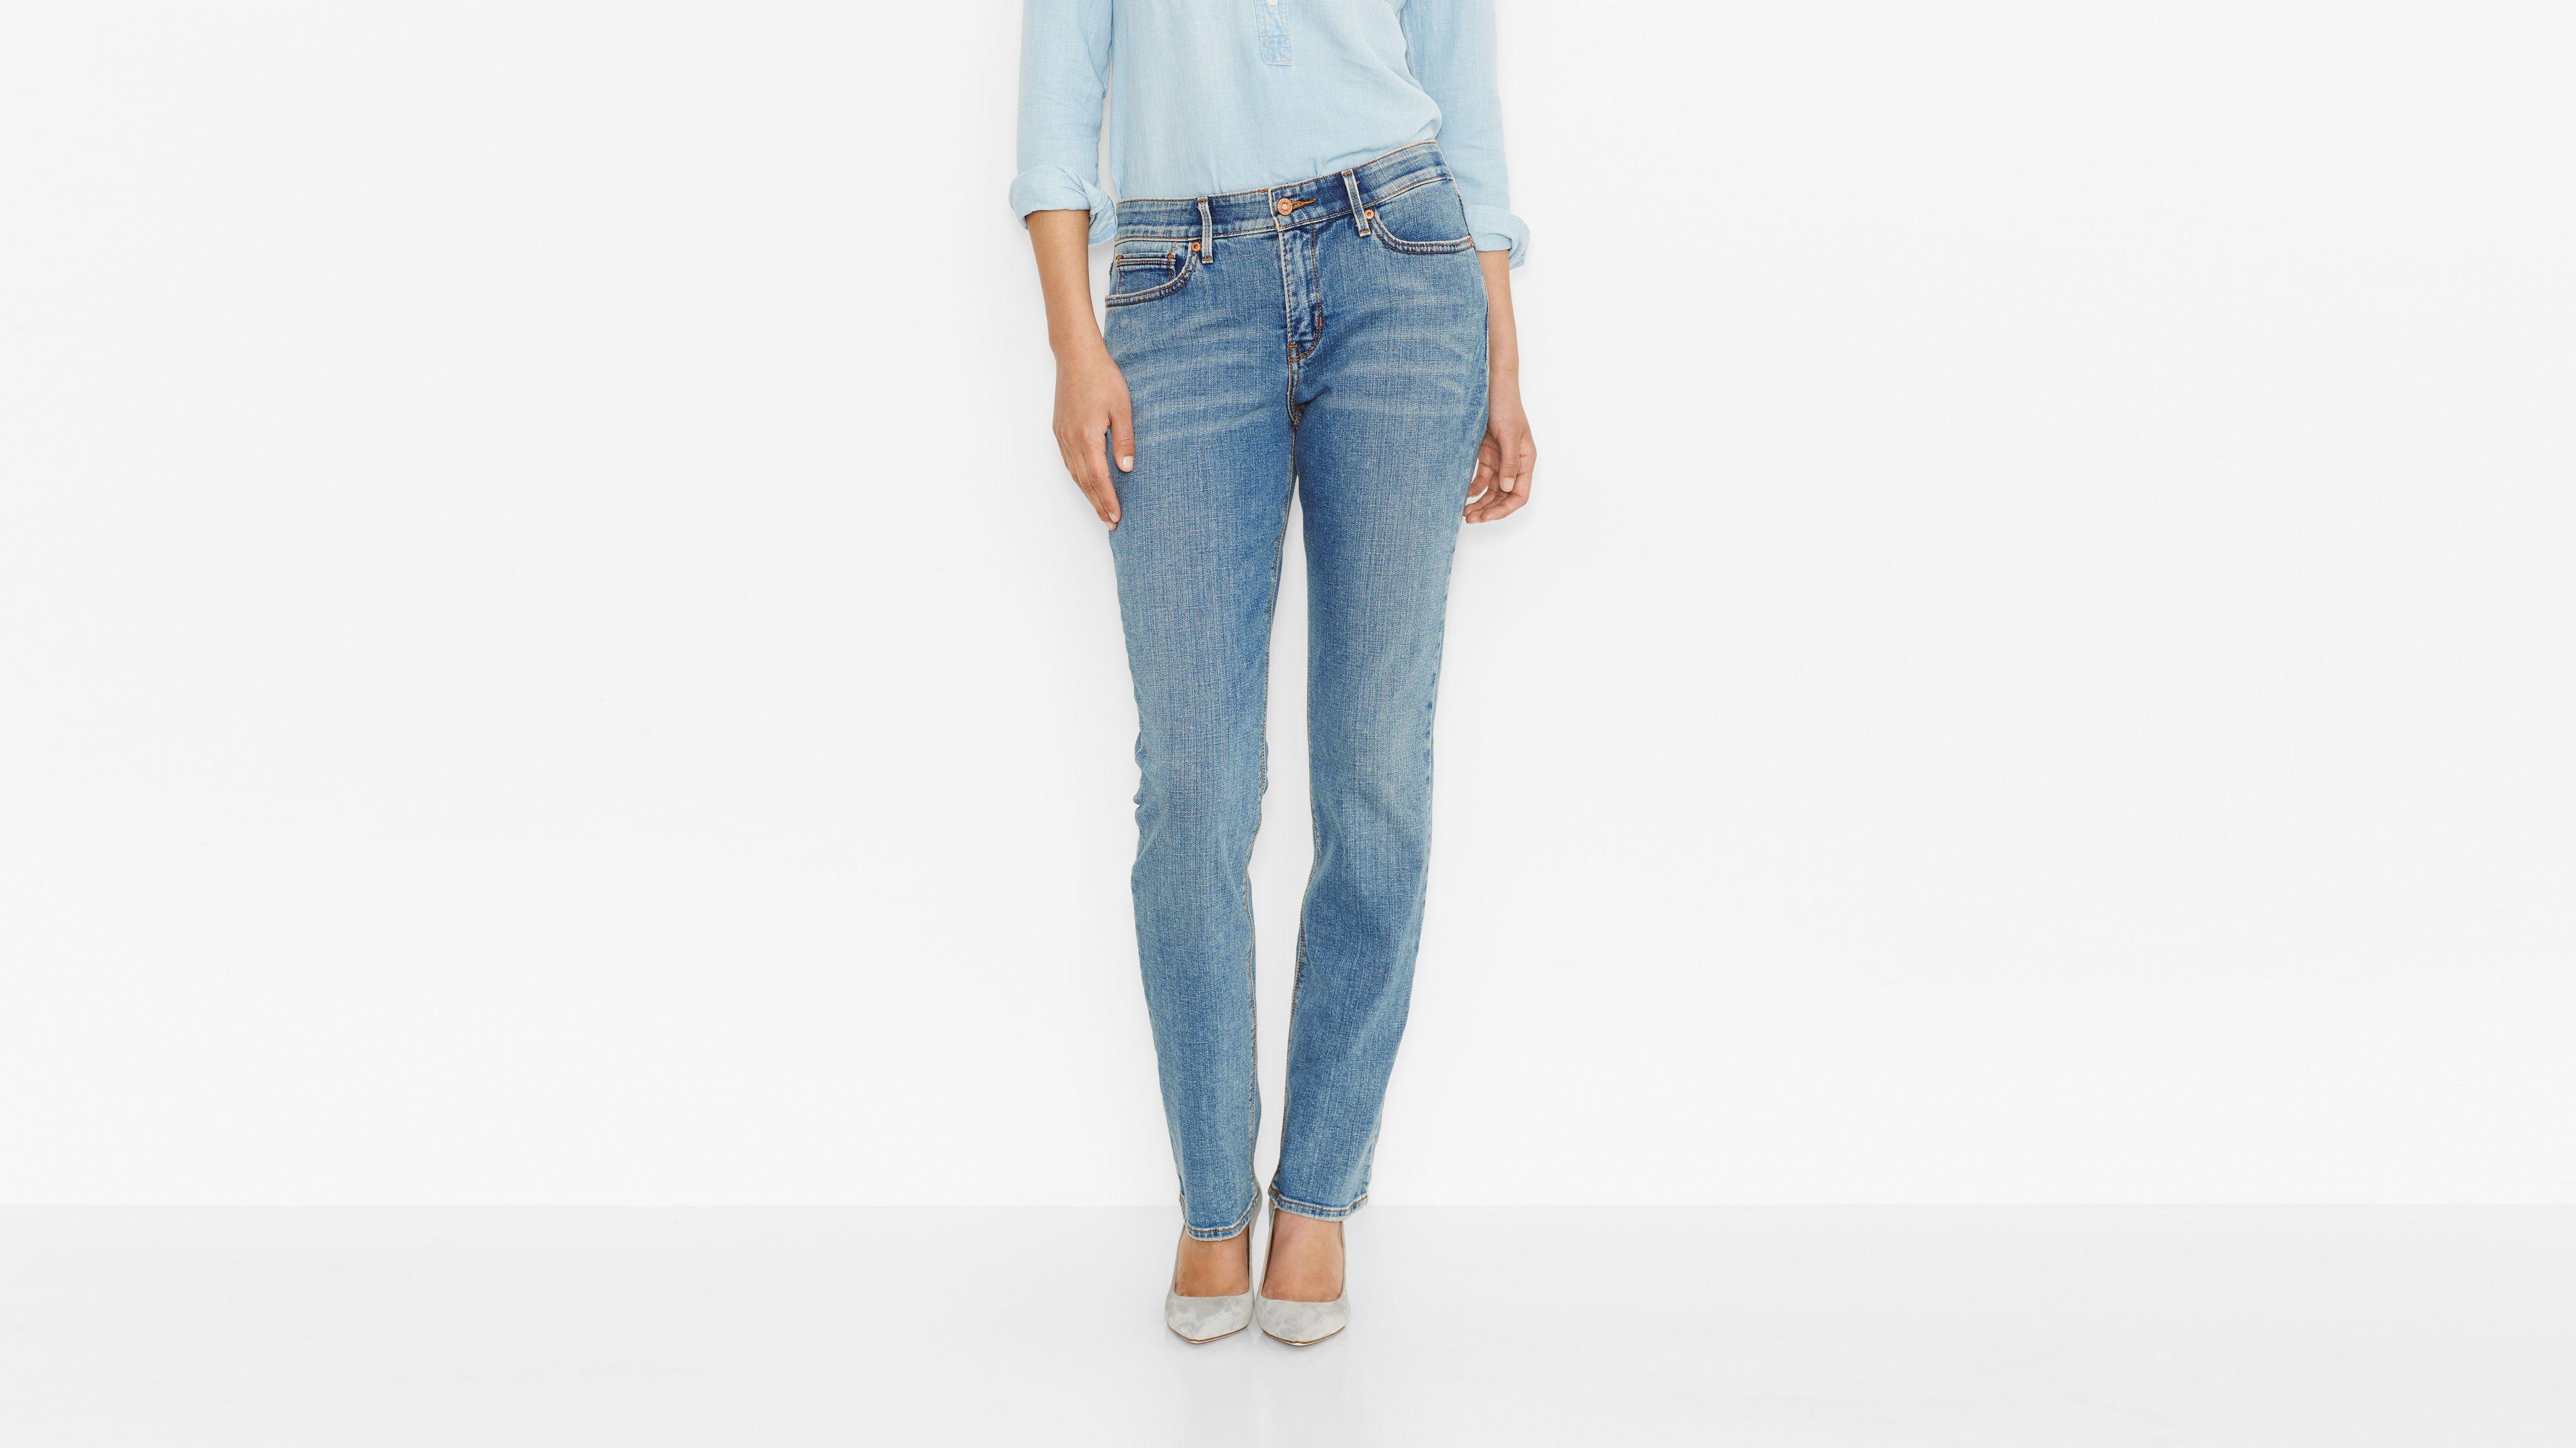 525™ Perfect Waist Straight Jeans - Sky